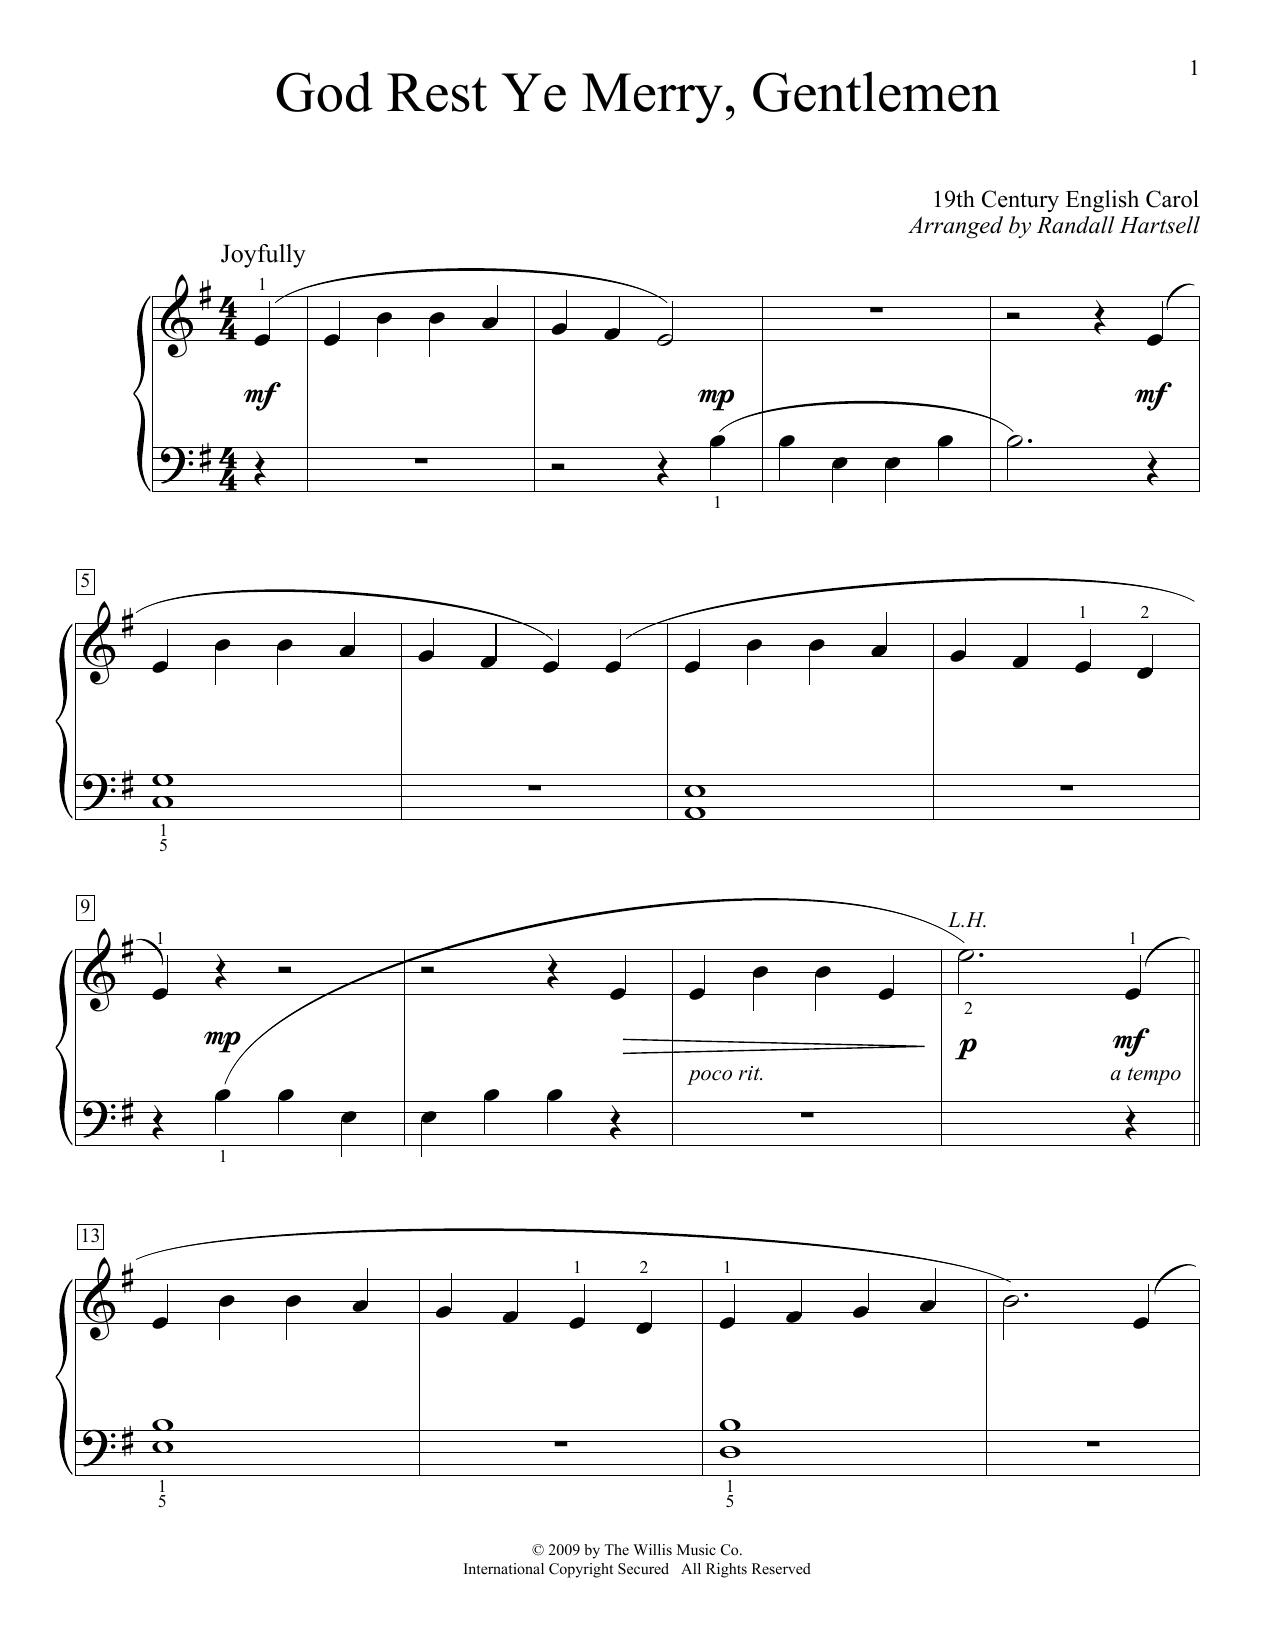 God Rest Ye Merry, Gentlemen : Sheet Music Direct